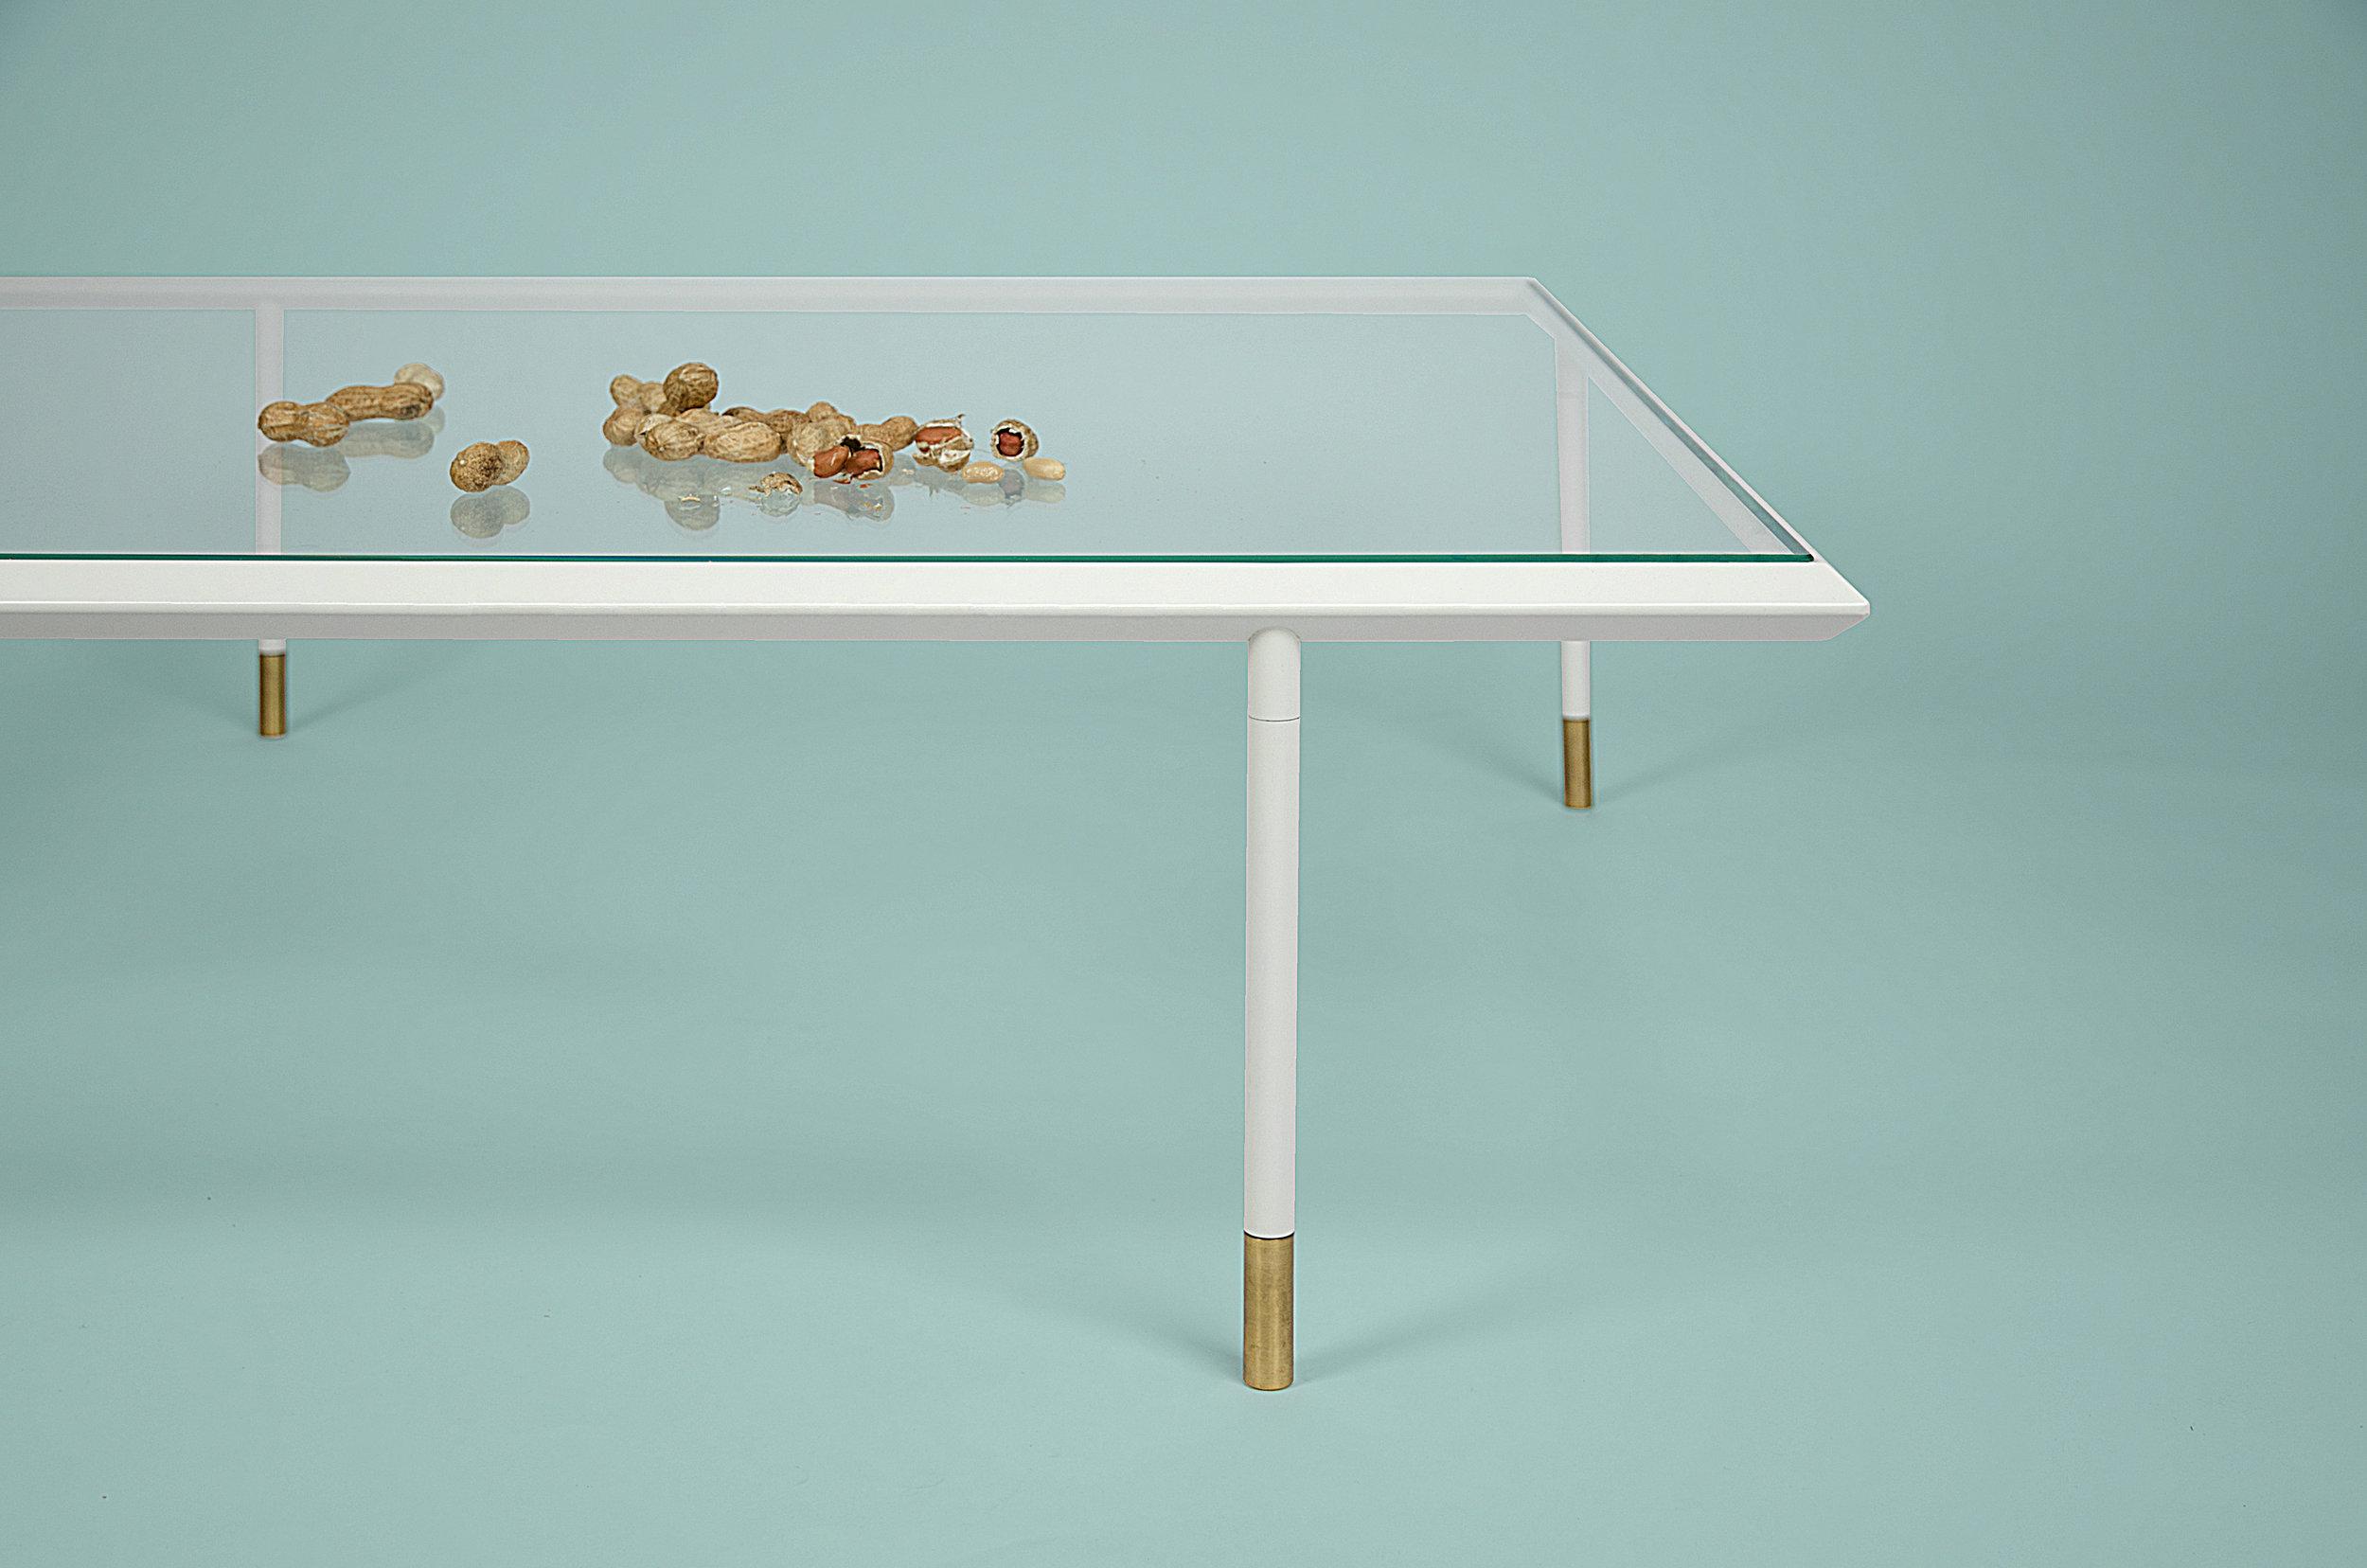 brutalesque-table_furniture-design_coordination-berlin_02.jpg